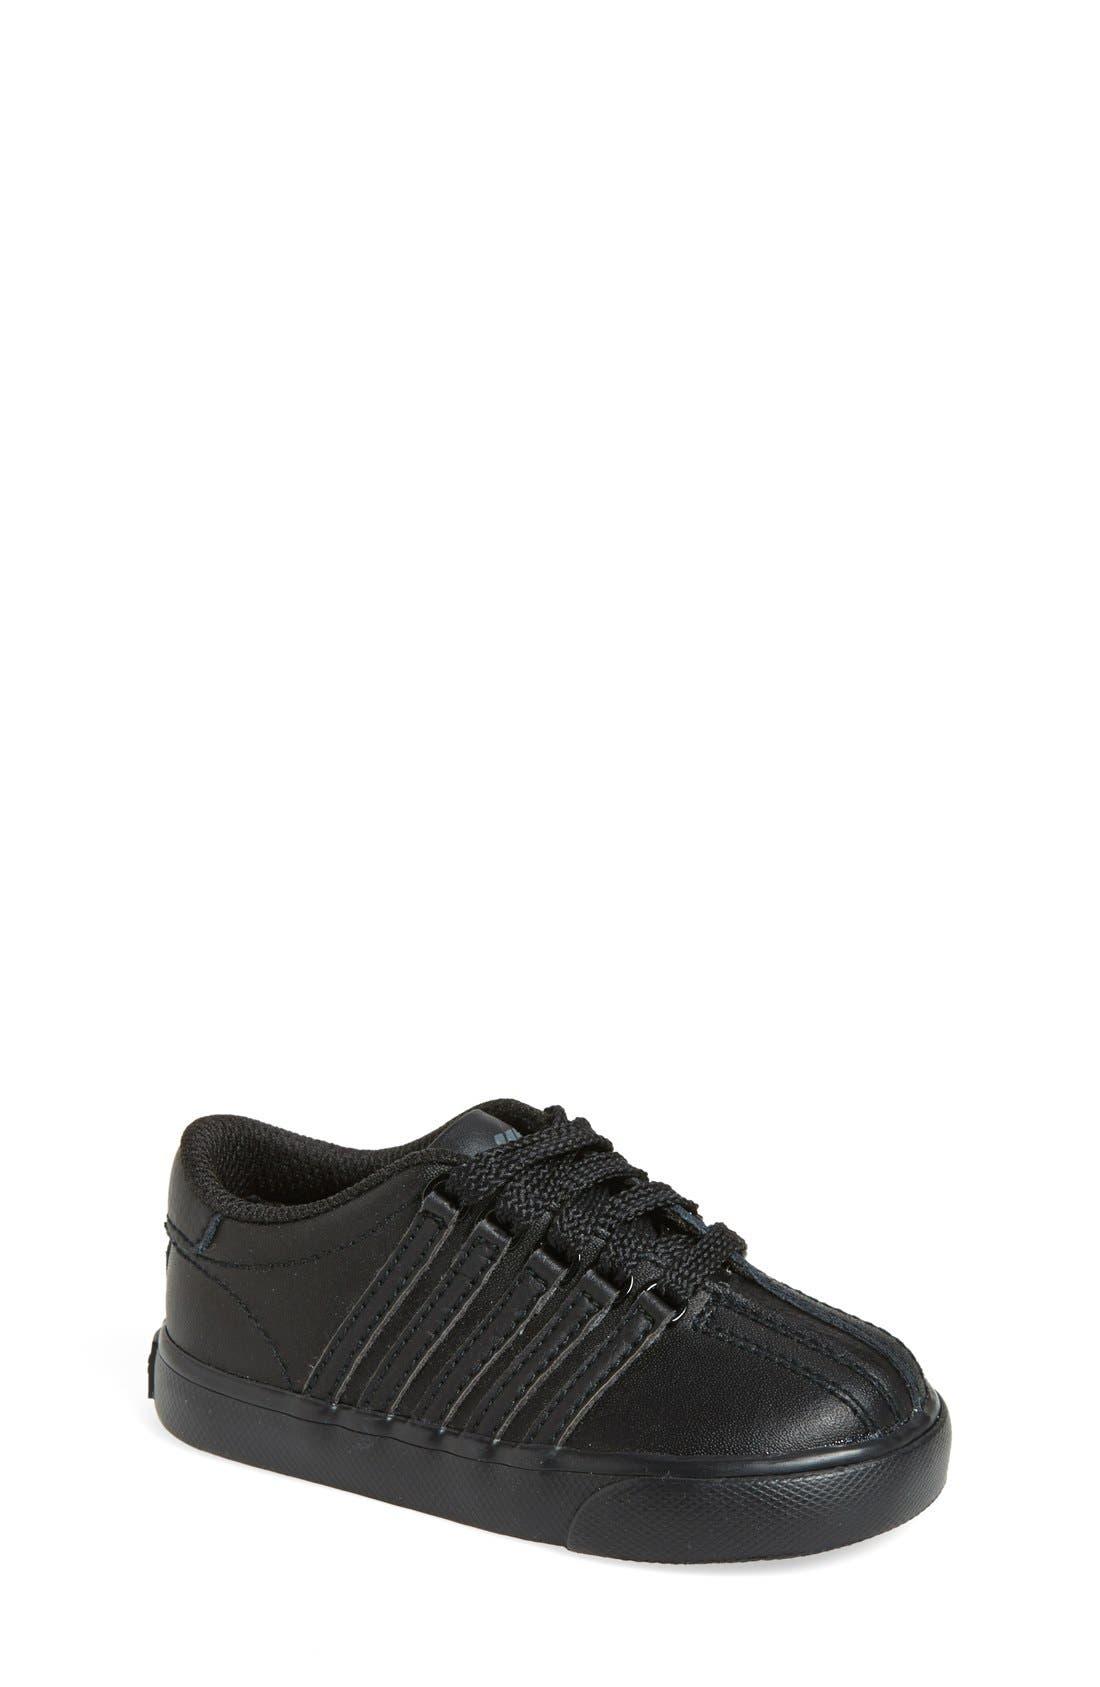 'Classic' Sneaker,                         Main,                         color, 001